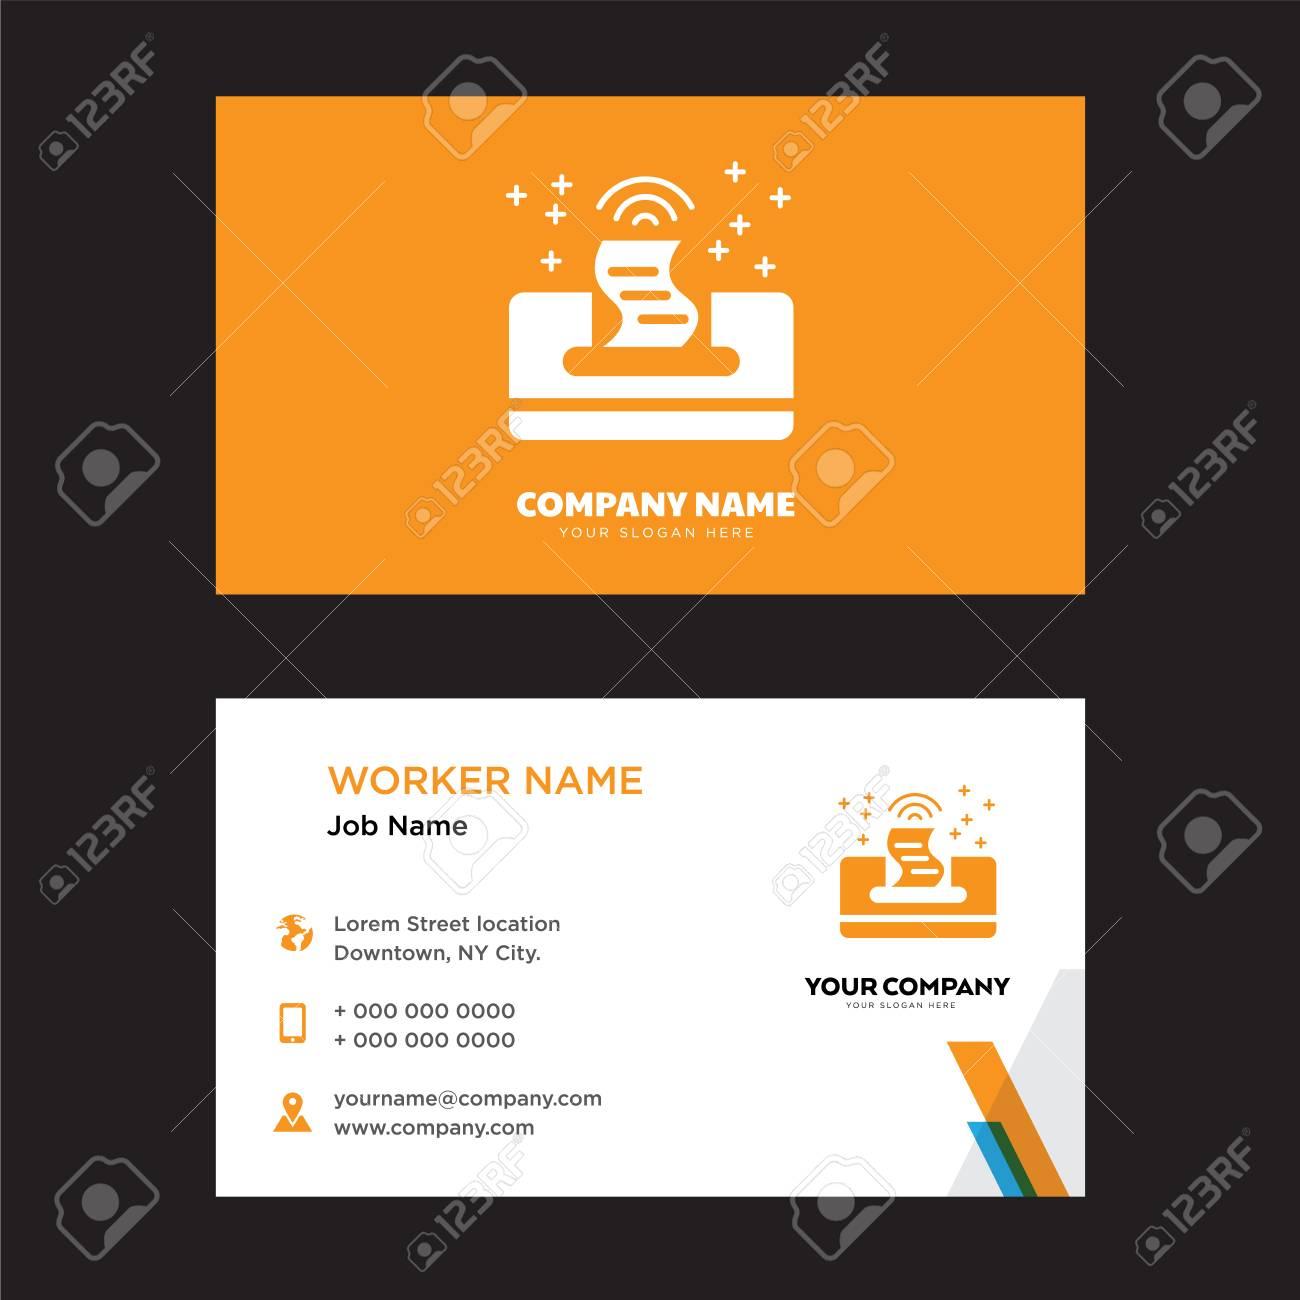 Printer business card design template visiting for your company printer business card design template visiting for your company modern horizontal identity card vector flashek Gallery